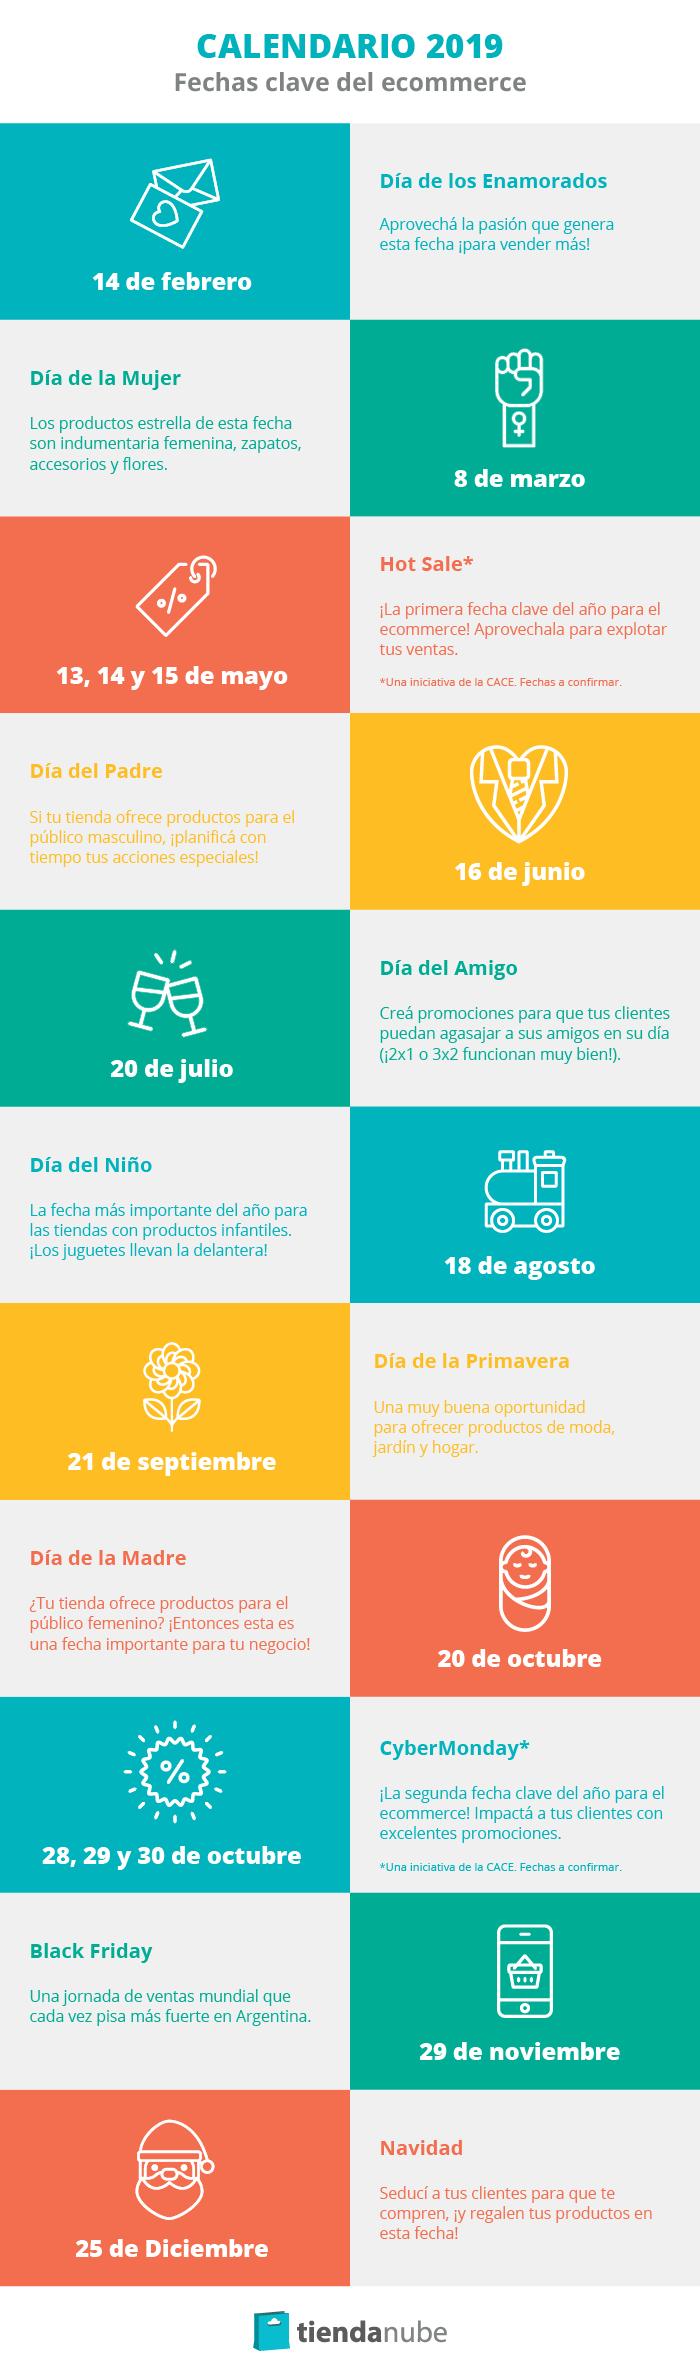 Calendario ecommerce 2019